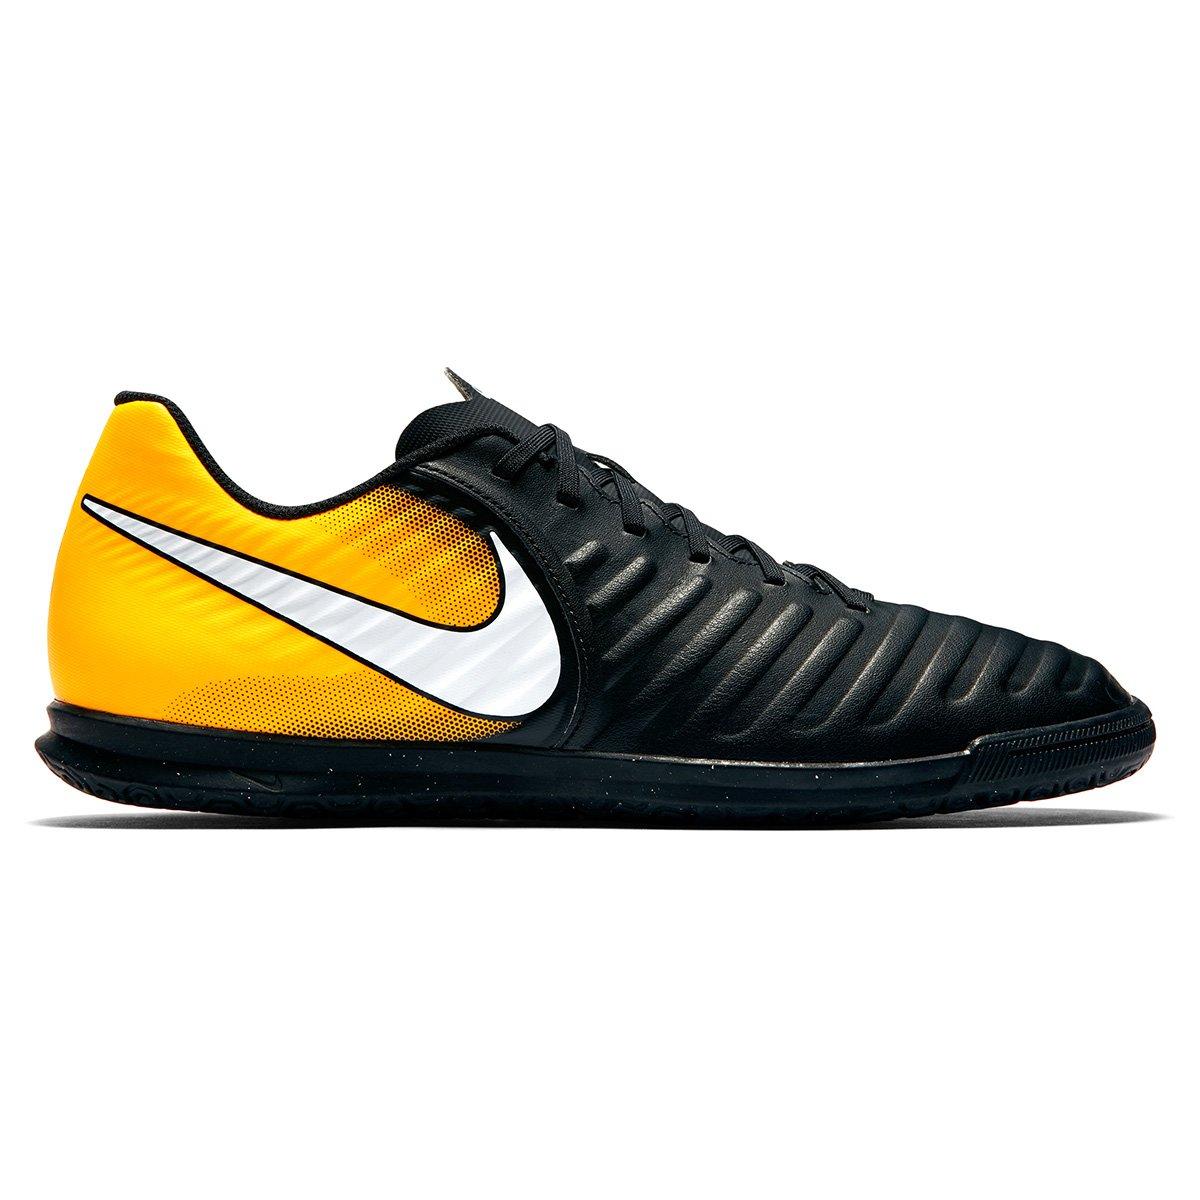 Chuteira Futsal Nike Tiempo Rio 4 IC - Preto e Laranja - Compre ... 4fbf709f9dae8